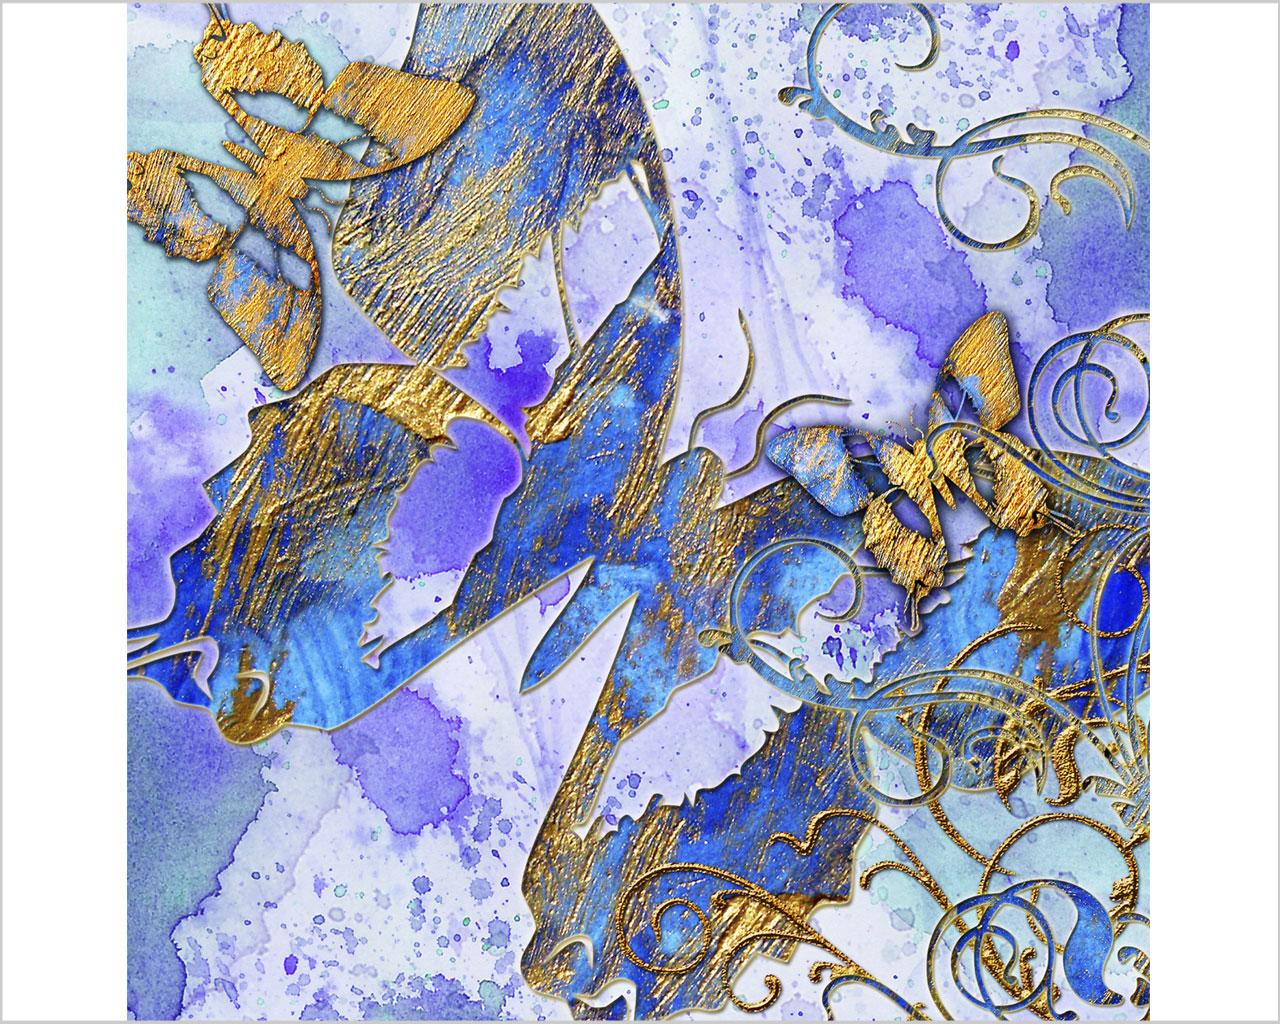 Stampa su tela - farfalle oro